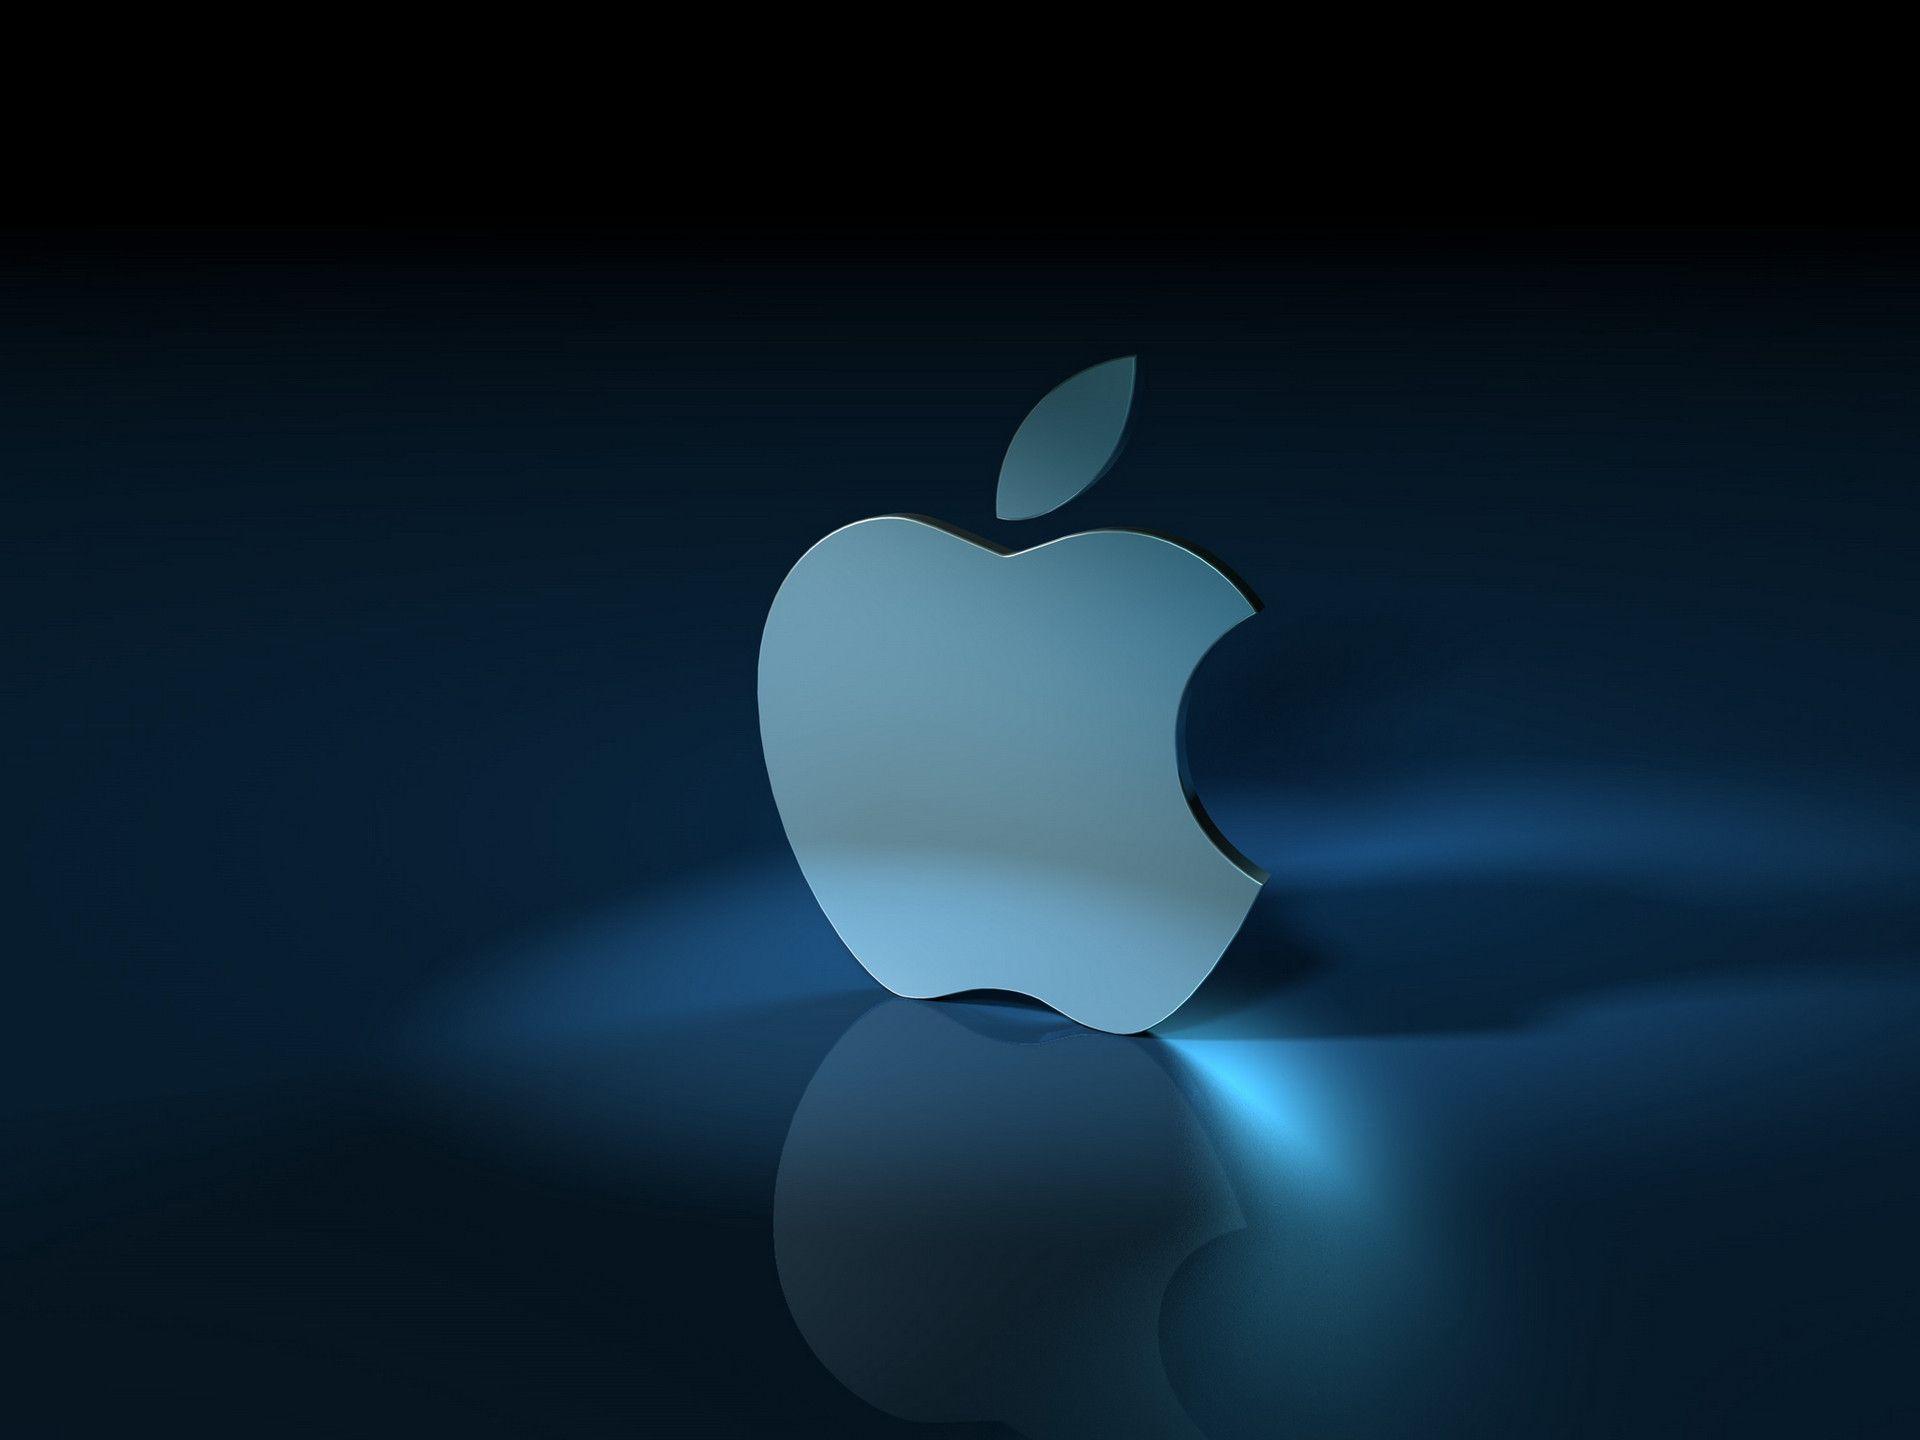 Wallpaper download apple - 3d Apple Logo Wallpaper Wallpaper Download